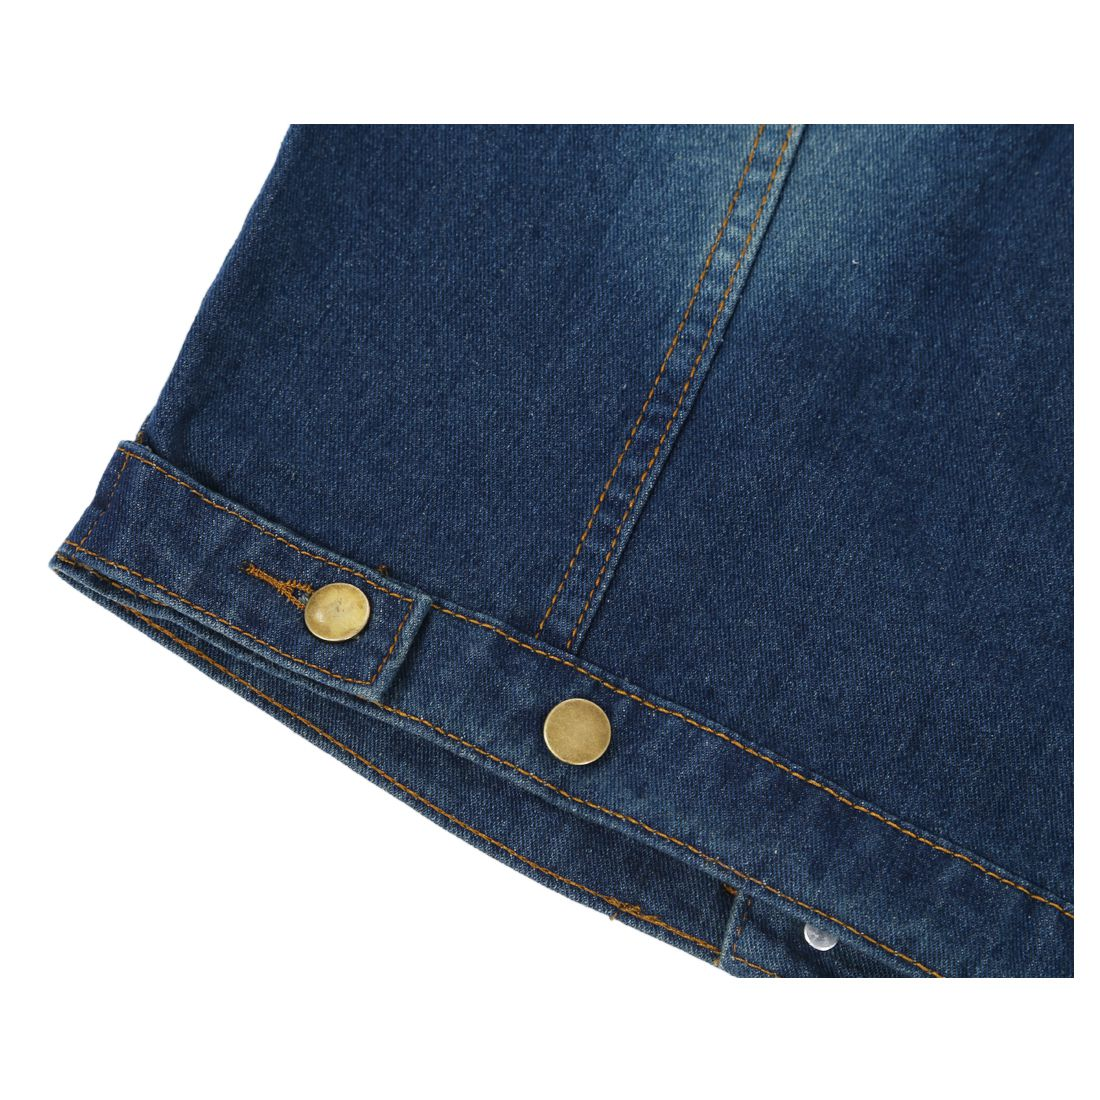 duenne jeansjacke herren dunkle jacke blau xl h7t1 ebay. Black Bedroom Furniture Sets. Home Design Ideas